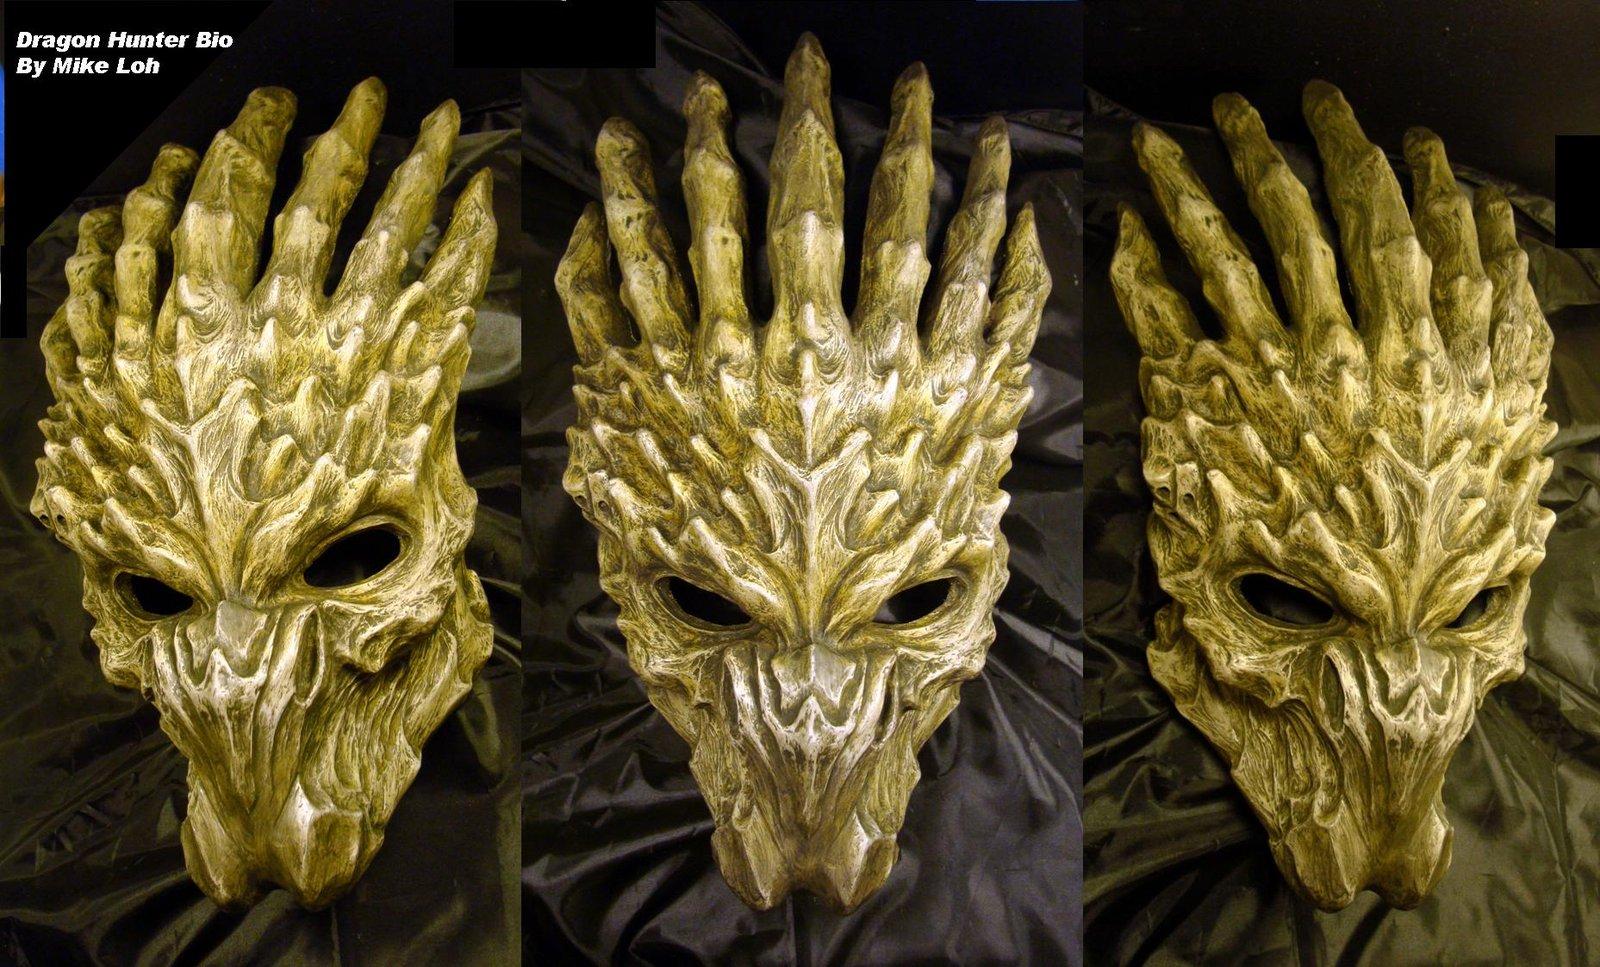 Dragon_Hunter_Bio_Bare_Bones_by_MichaelLoh.jpg